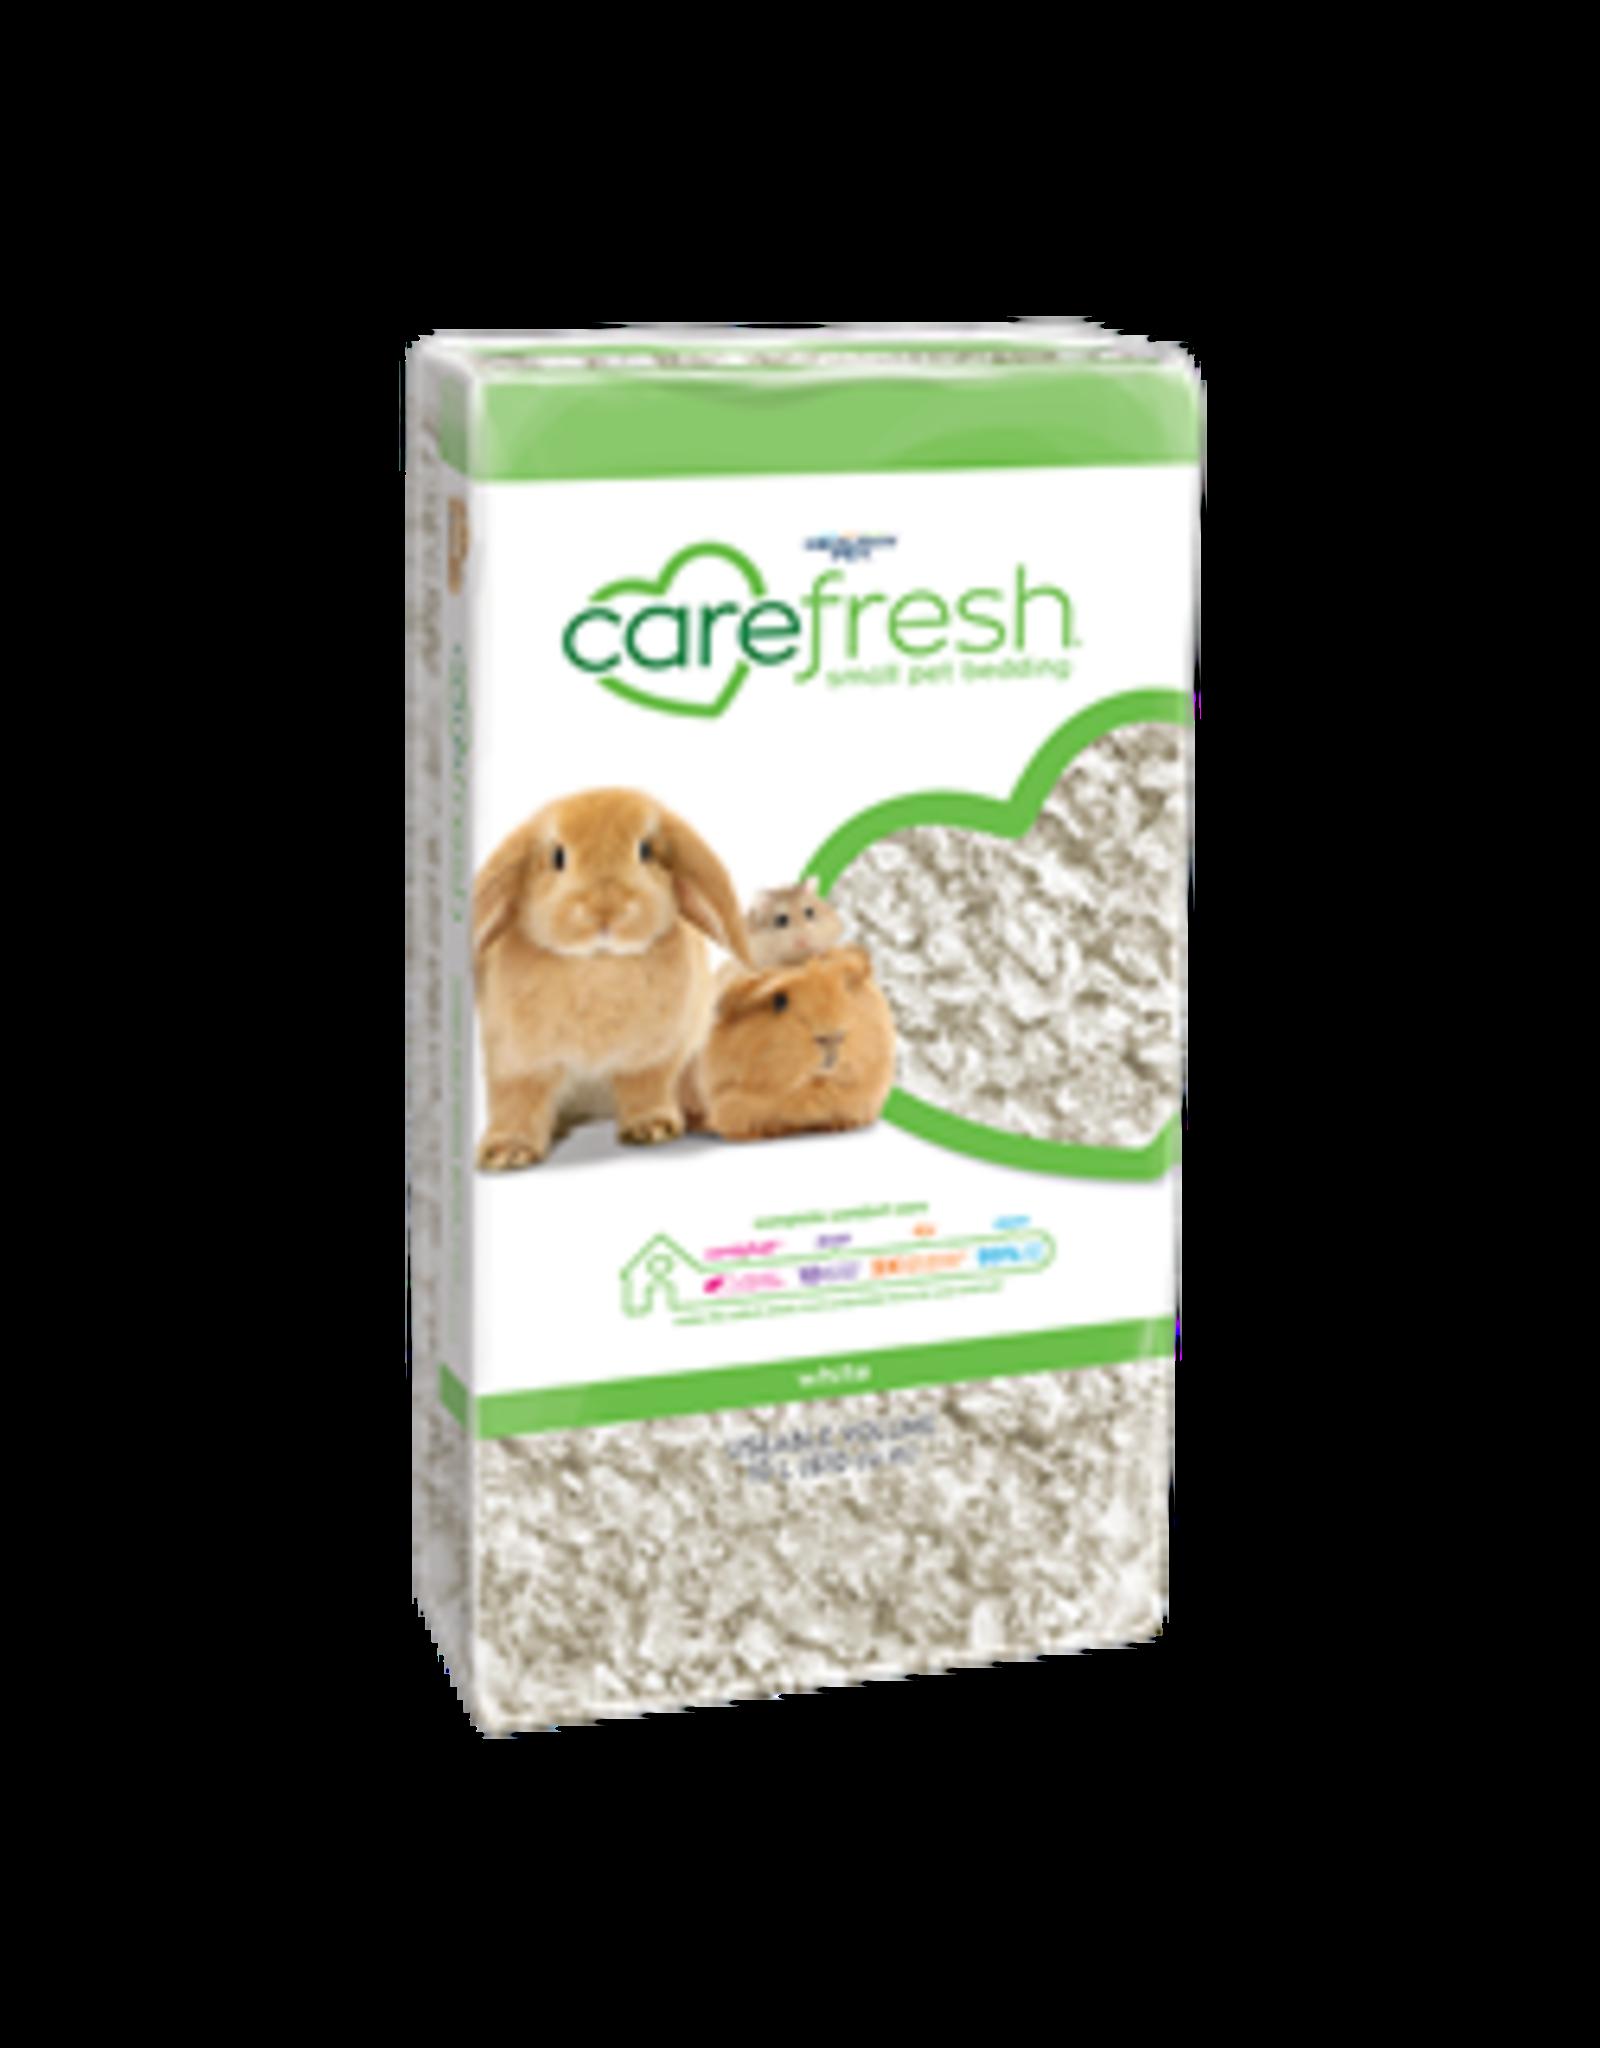 CareFresh Carefresh Complete White 10L